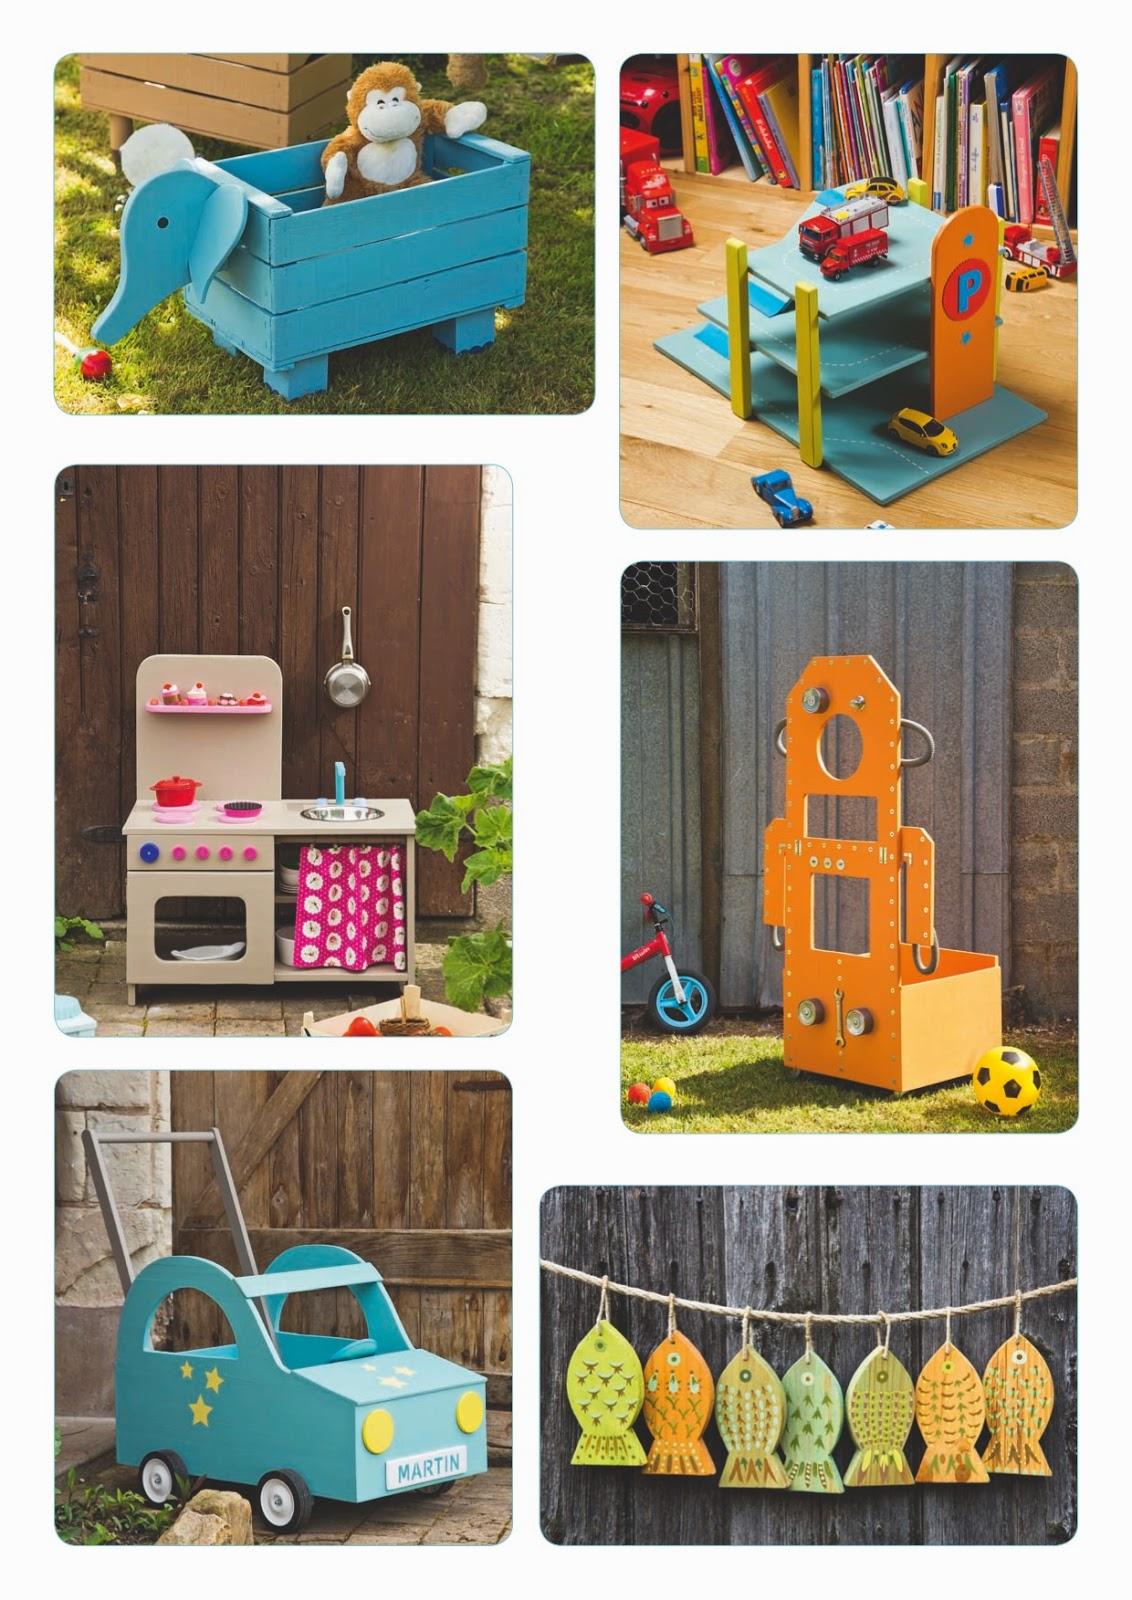 http://bit.ly/jouets-bois